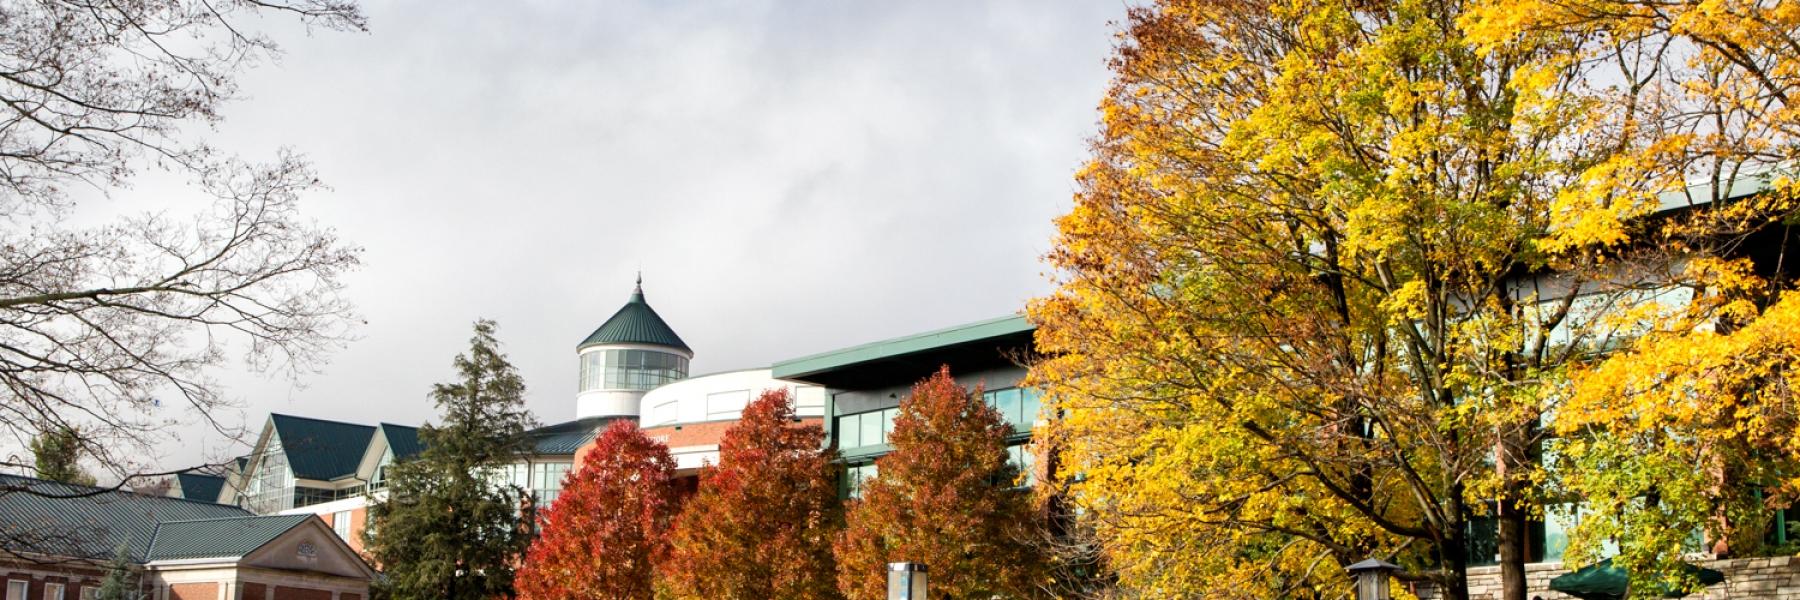 Image, Campus, Fall, Sunny